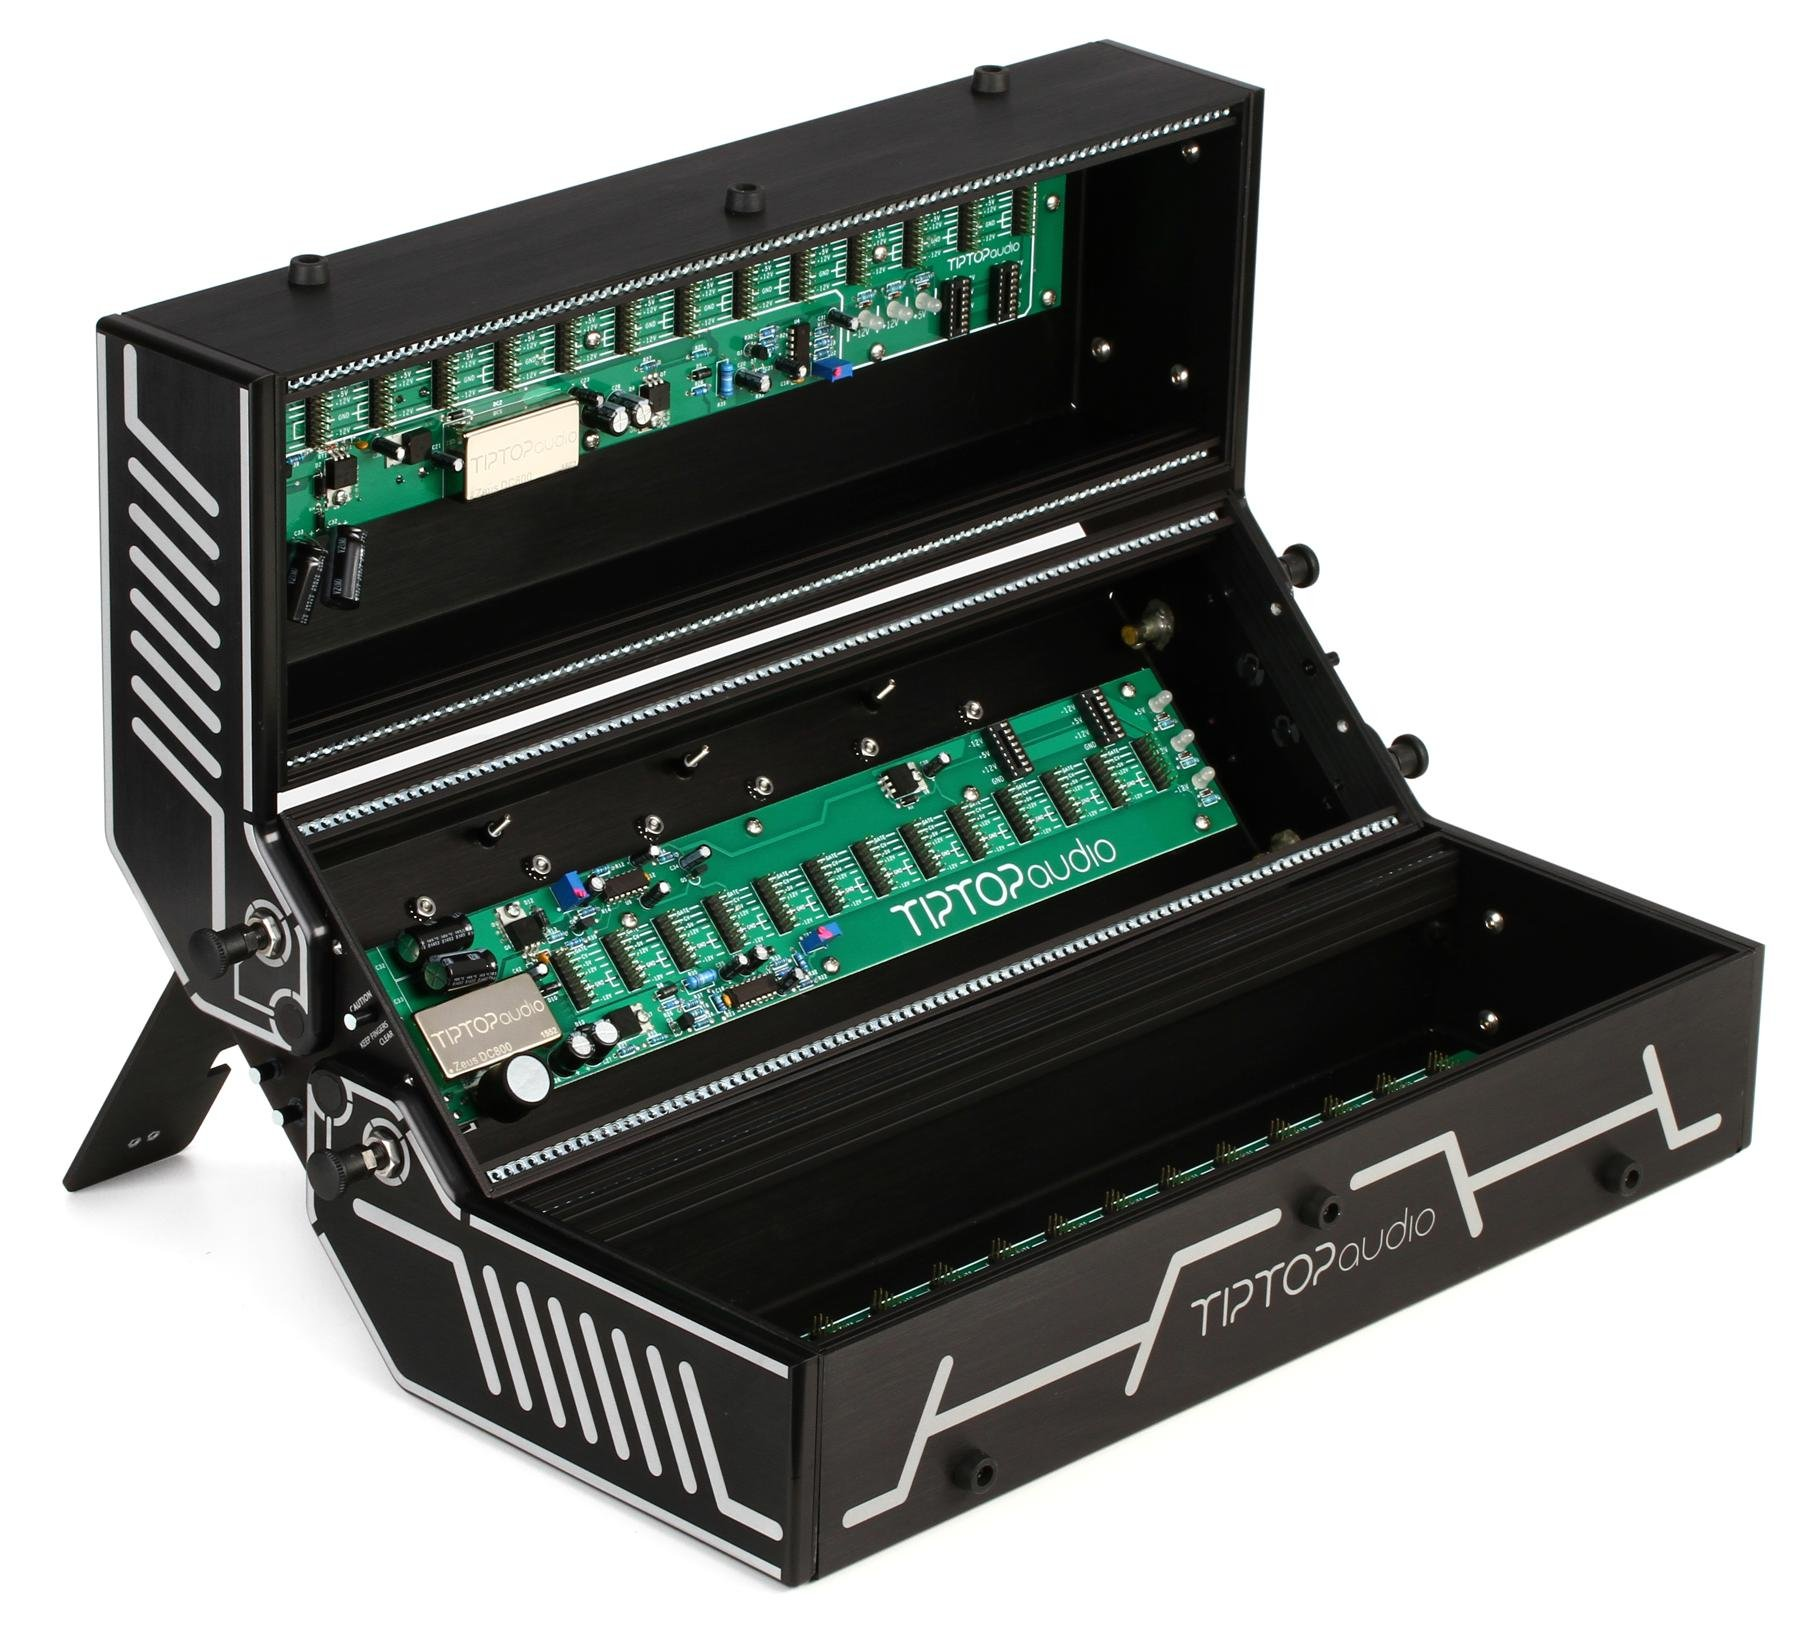 Tiptop Audio Station 252 Folding Eurorack Case Black Widow Computer Geek Circuit Board Green Magnetic Picture Frame Image 1